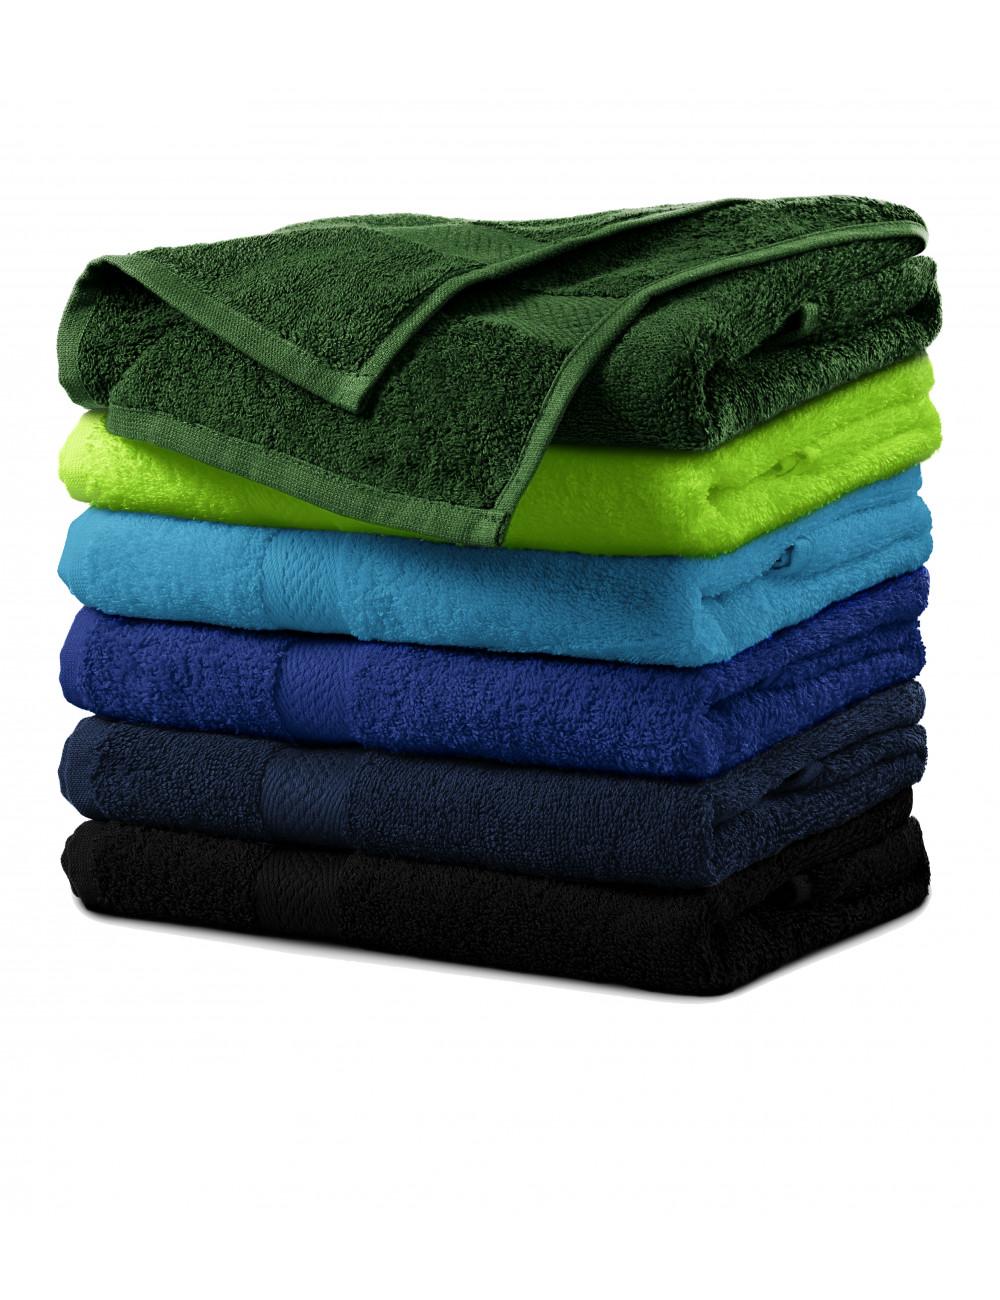 Adler MALFINI Ręcznik unisex Terry Towel 903 zieleń butelkowa